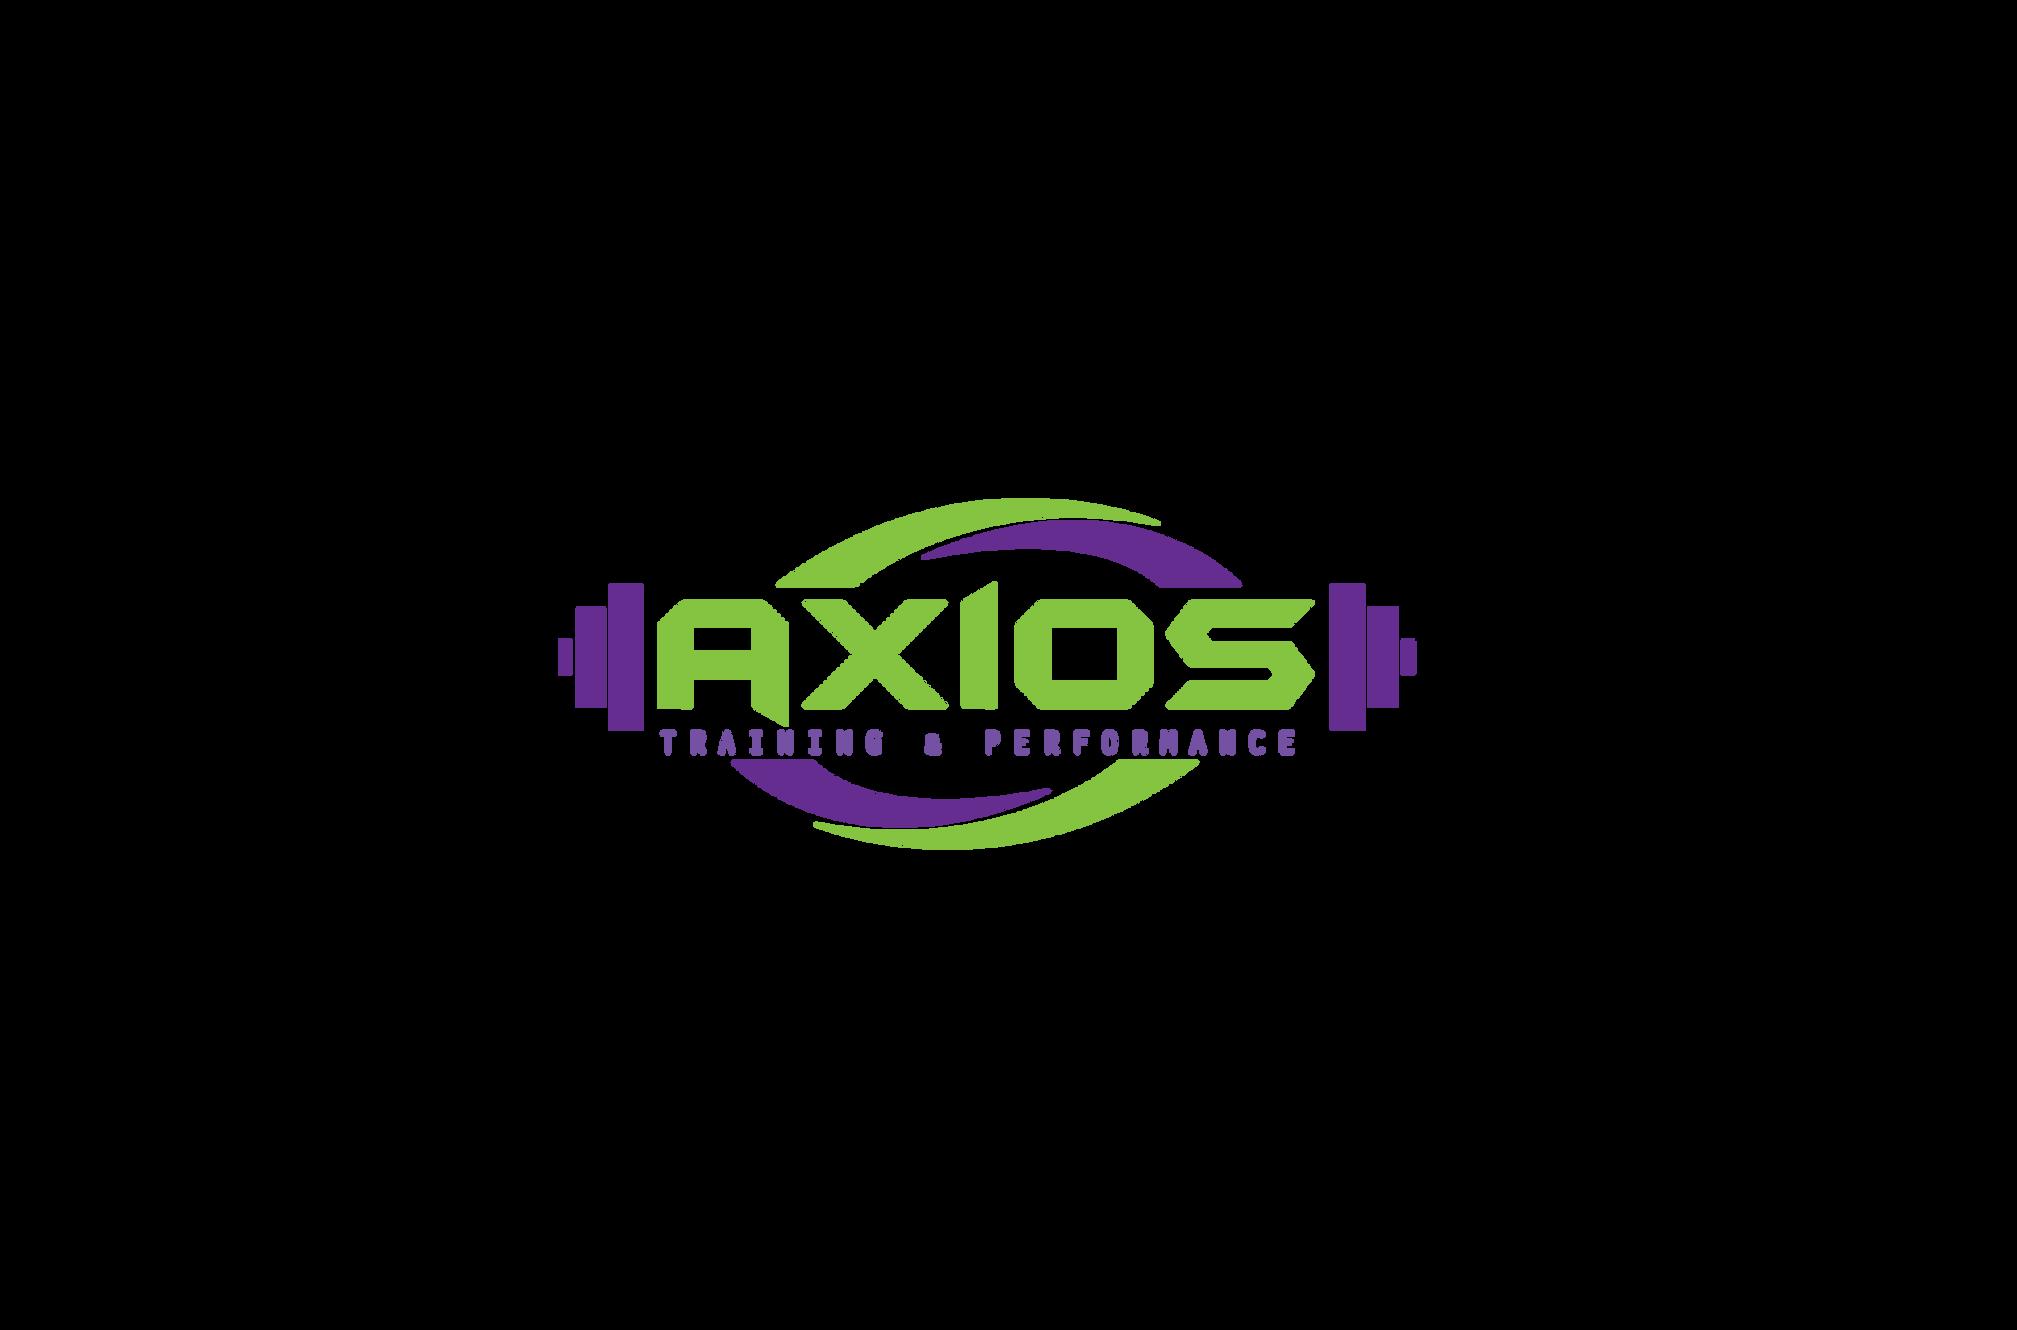 Axios Training & Performance   Hartford   Fitness   Sports